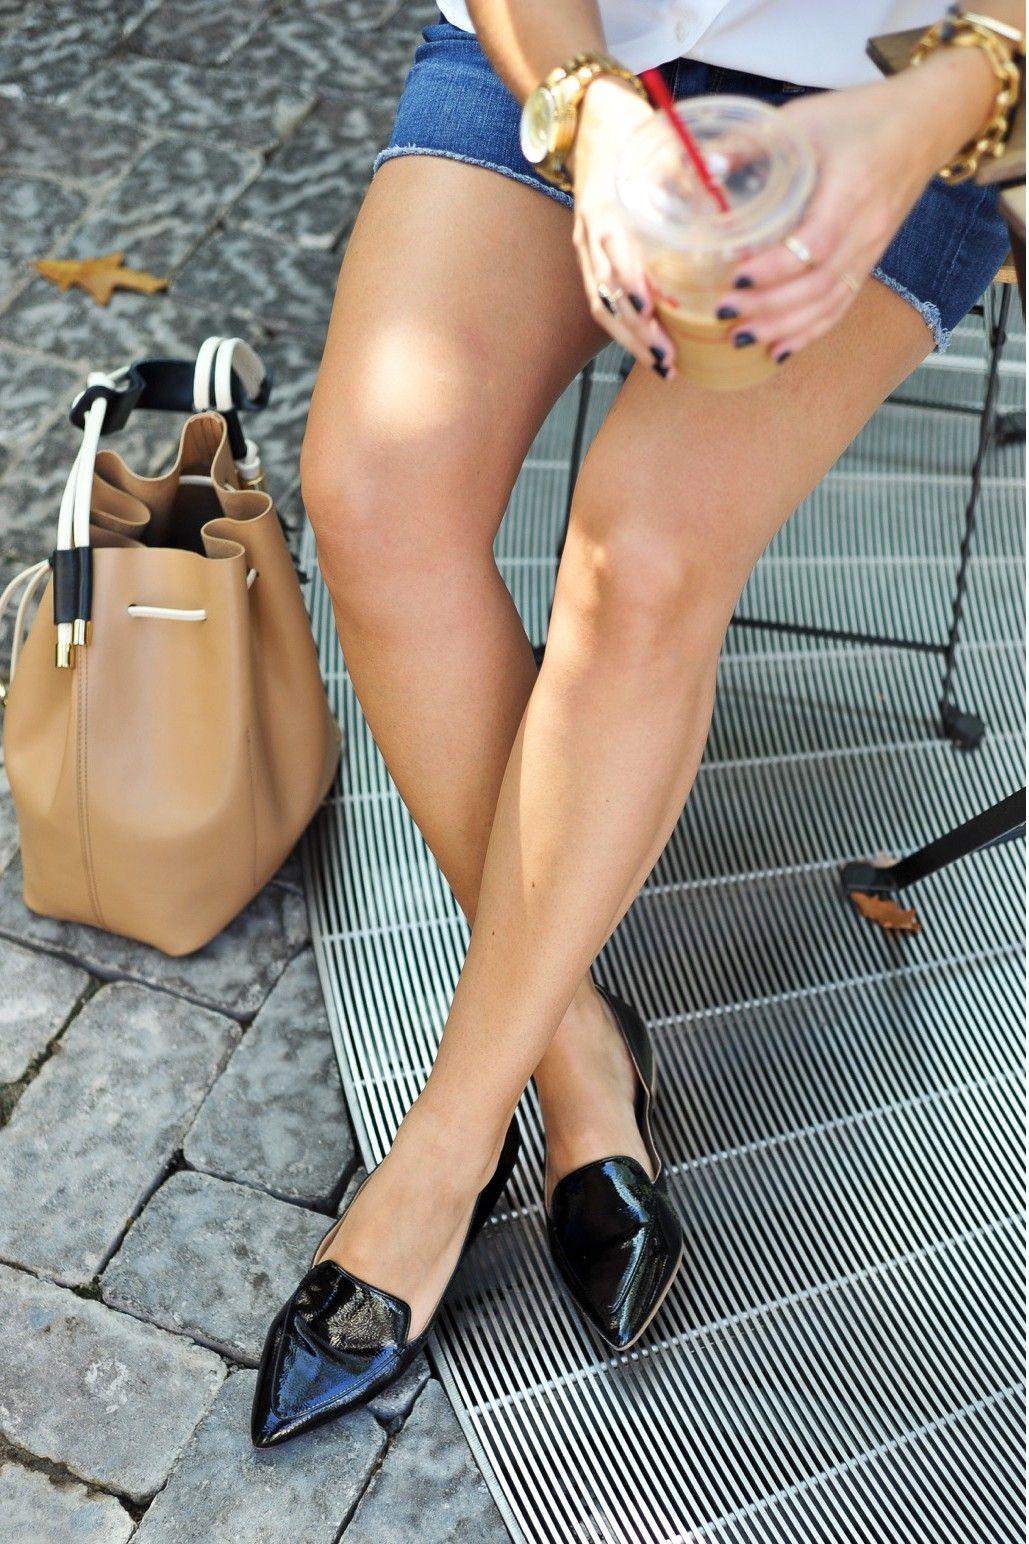 24594c39932 Black patent smoking slippers by Sole Society Jahreszeiten